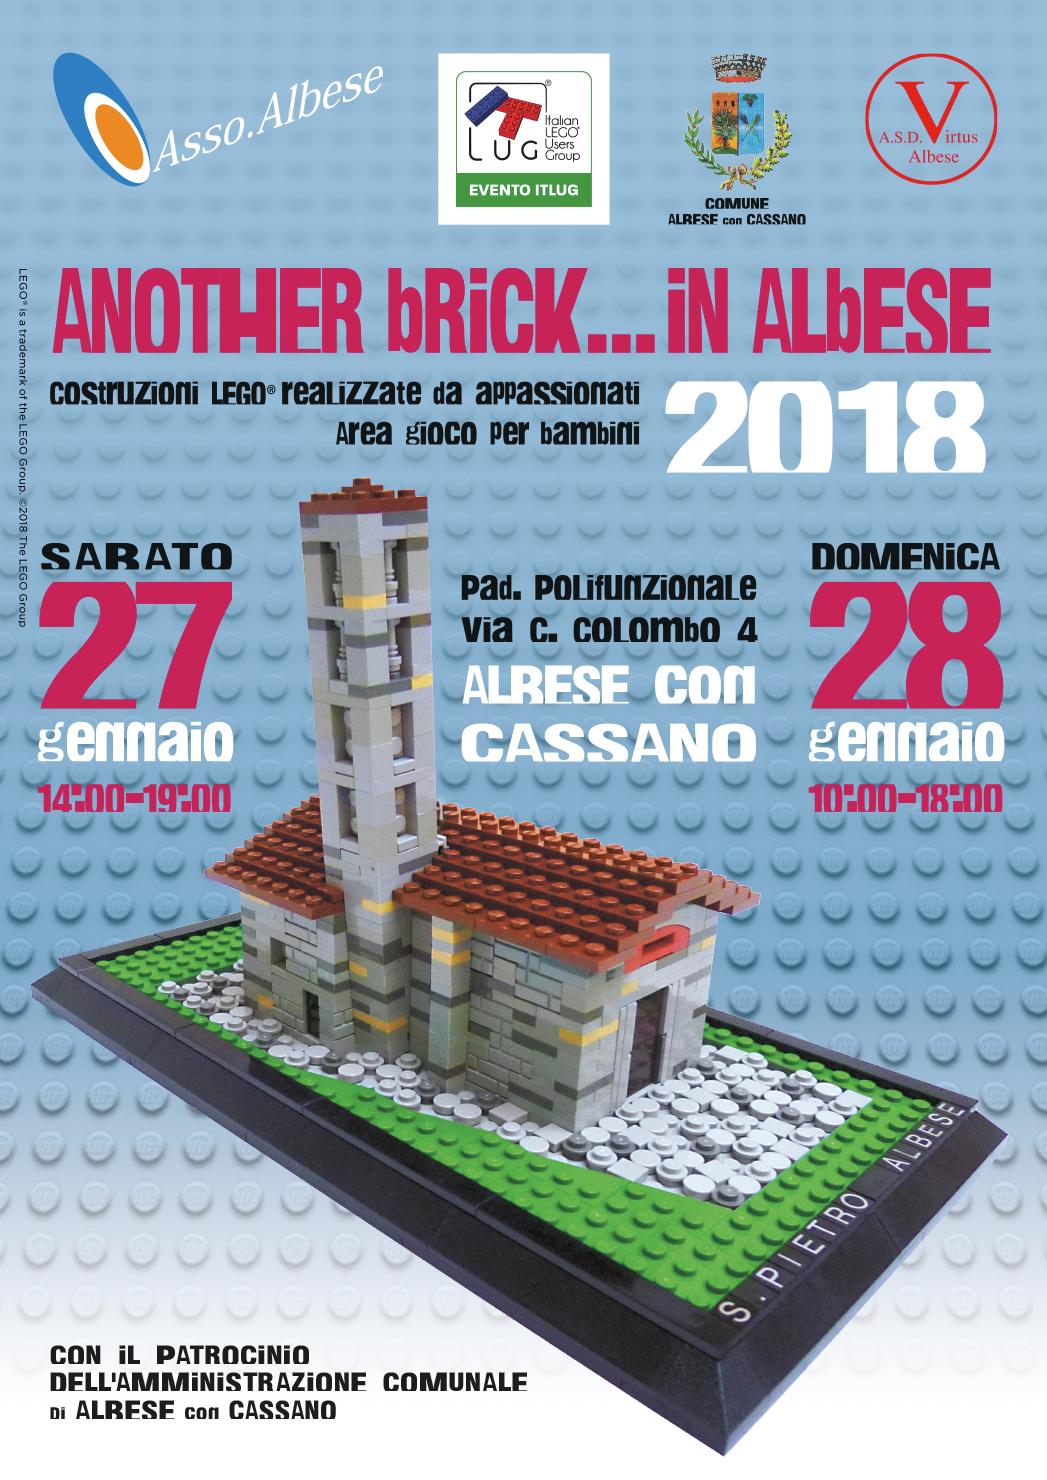 Locandina_ItLUG_ALBESE-2018_02.jpg